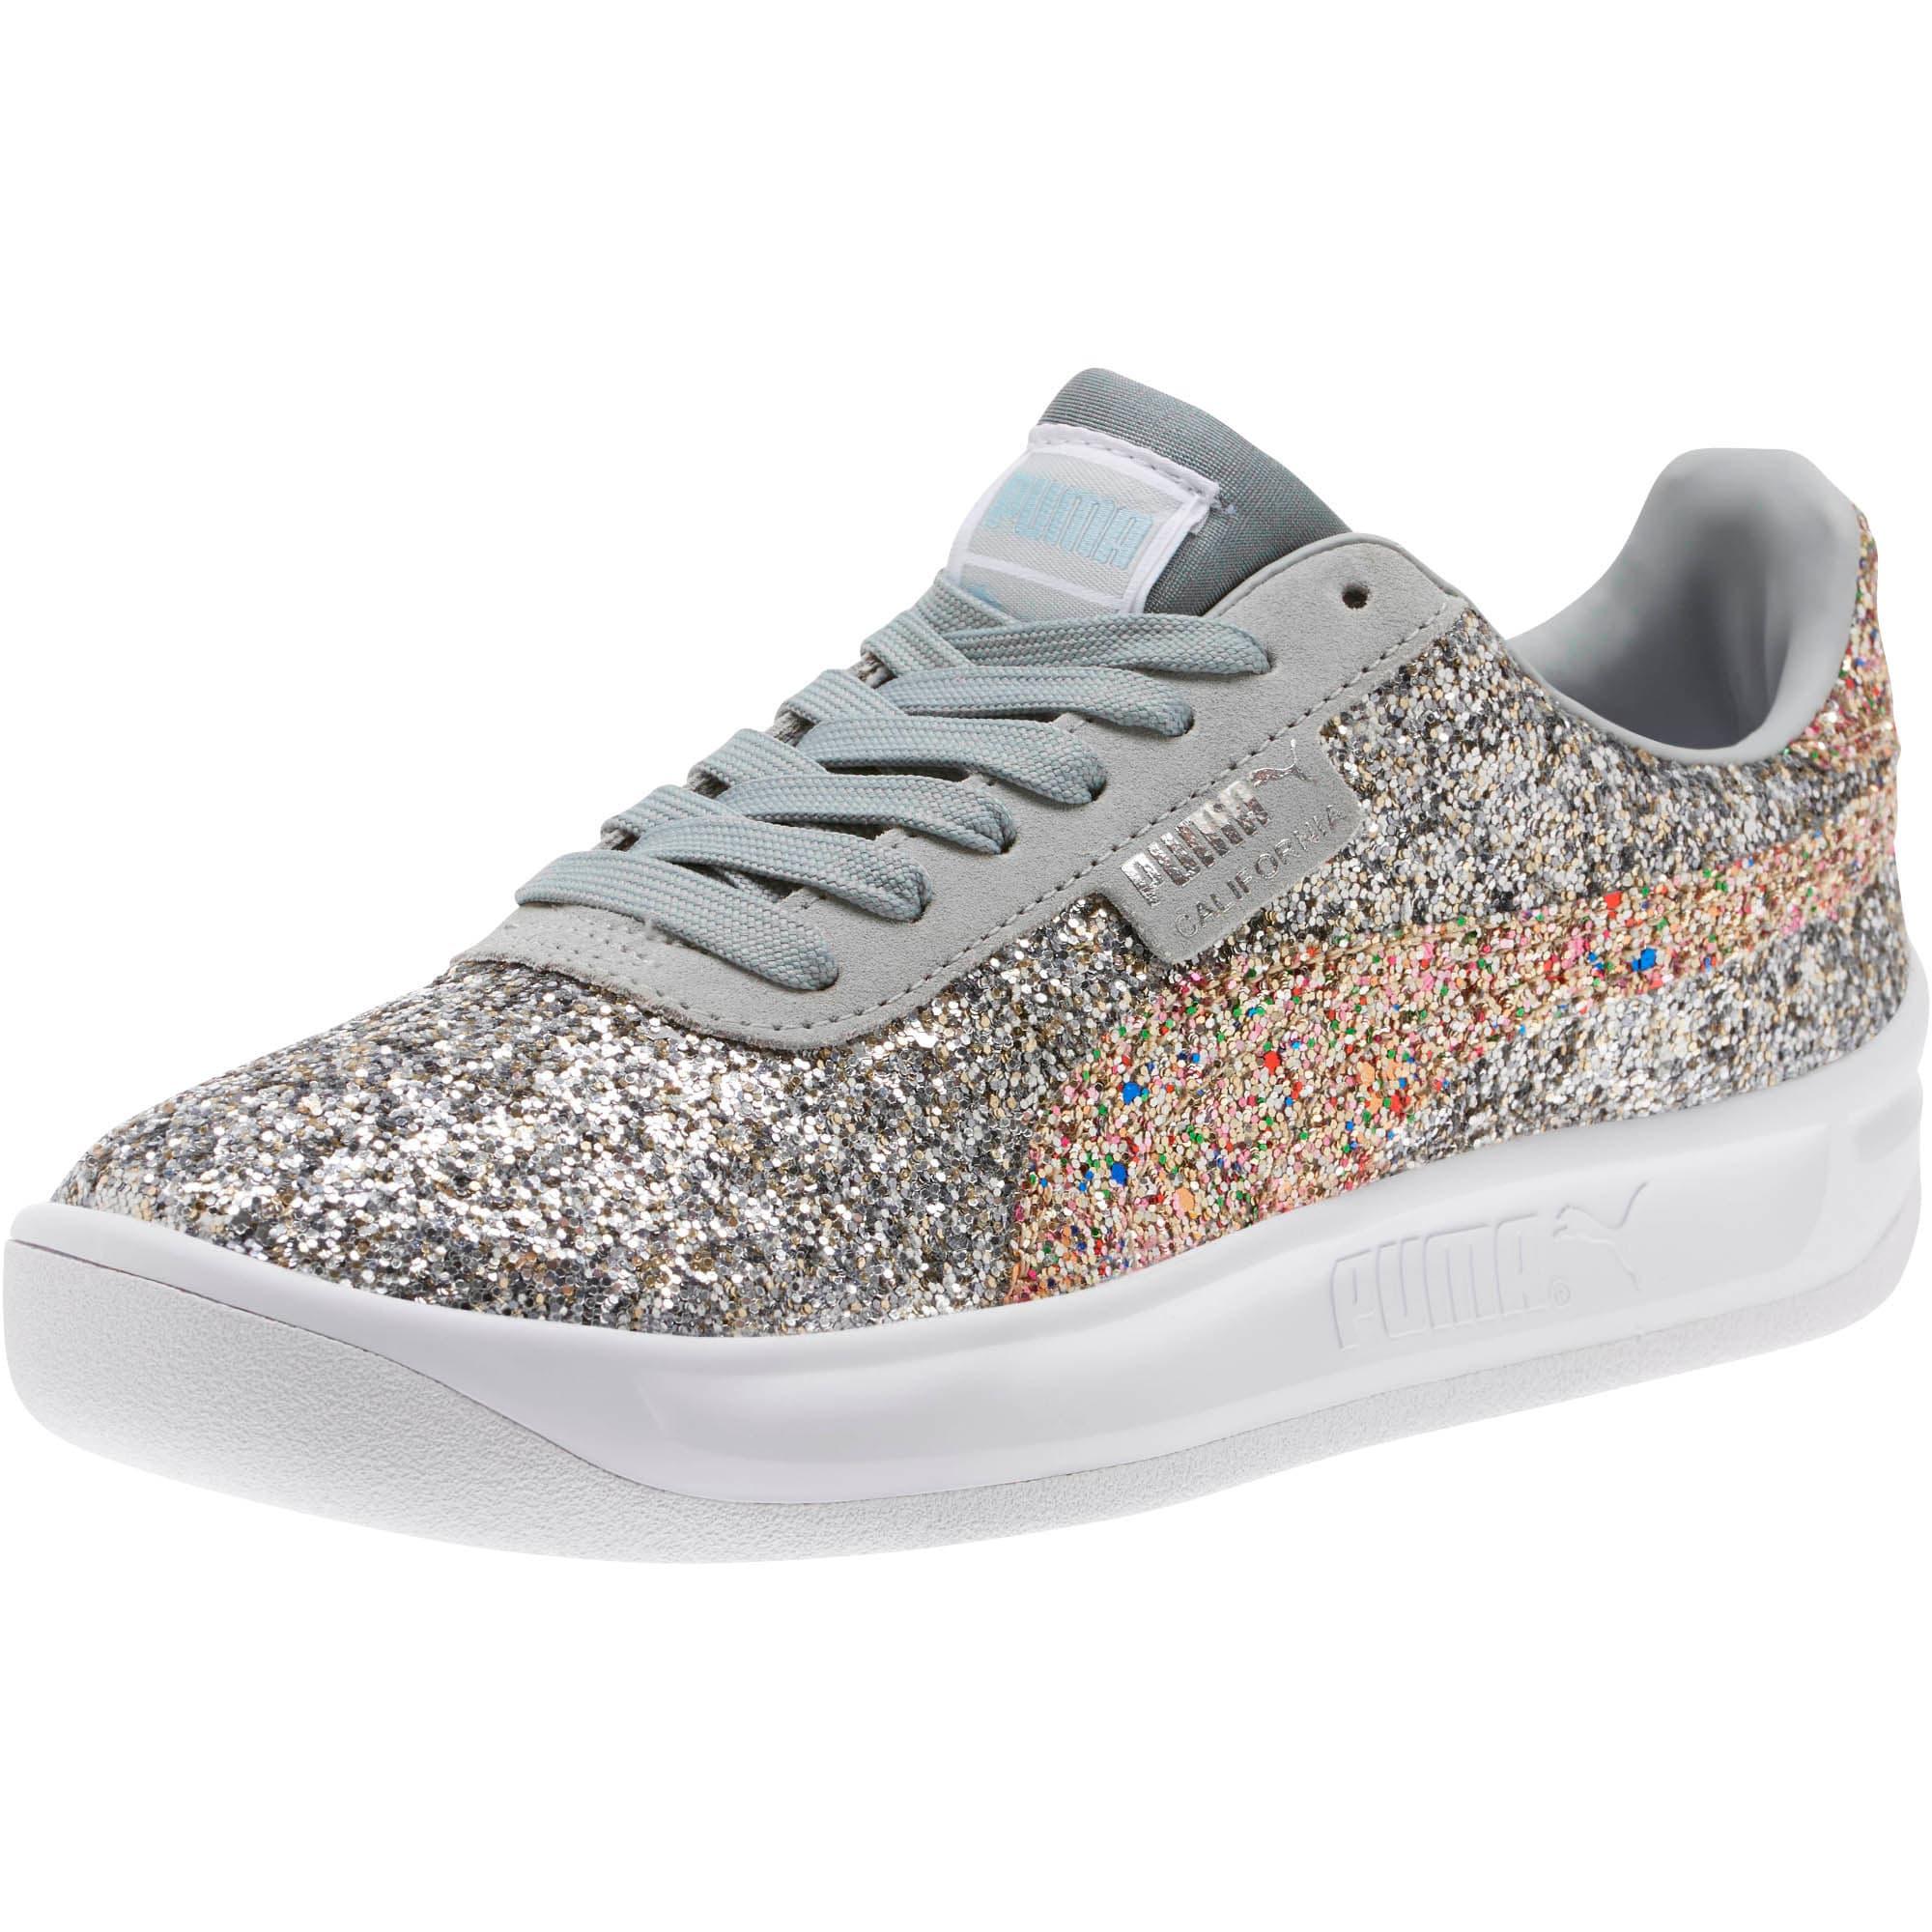 Thumbnail 1 of California Glitz Women's Sneakers, Silver-CERULEAN-Quarry, medium